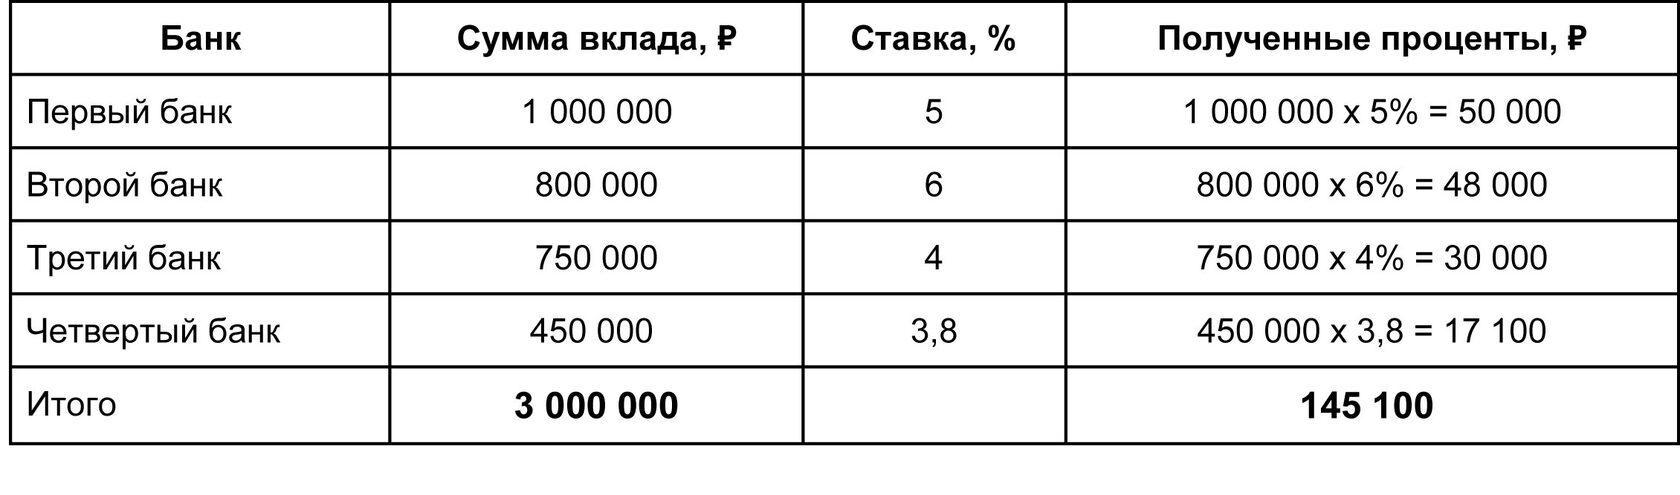 пример расчета налога на вклады